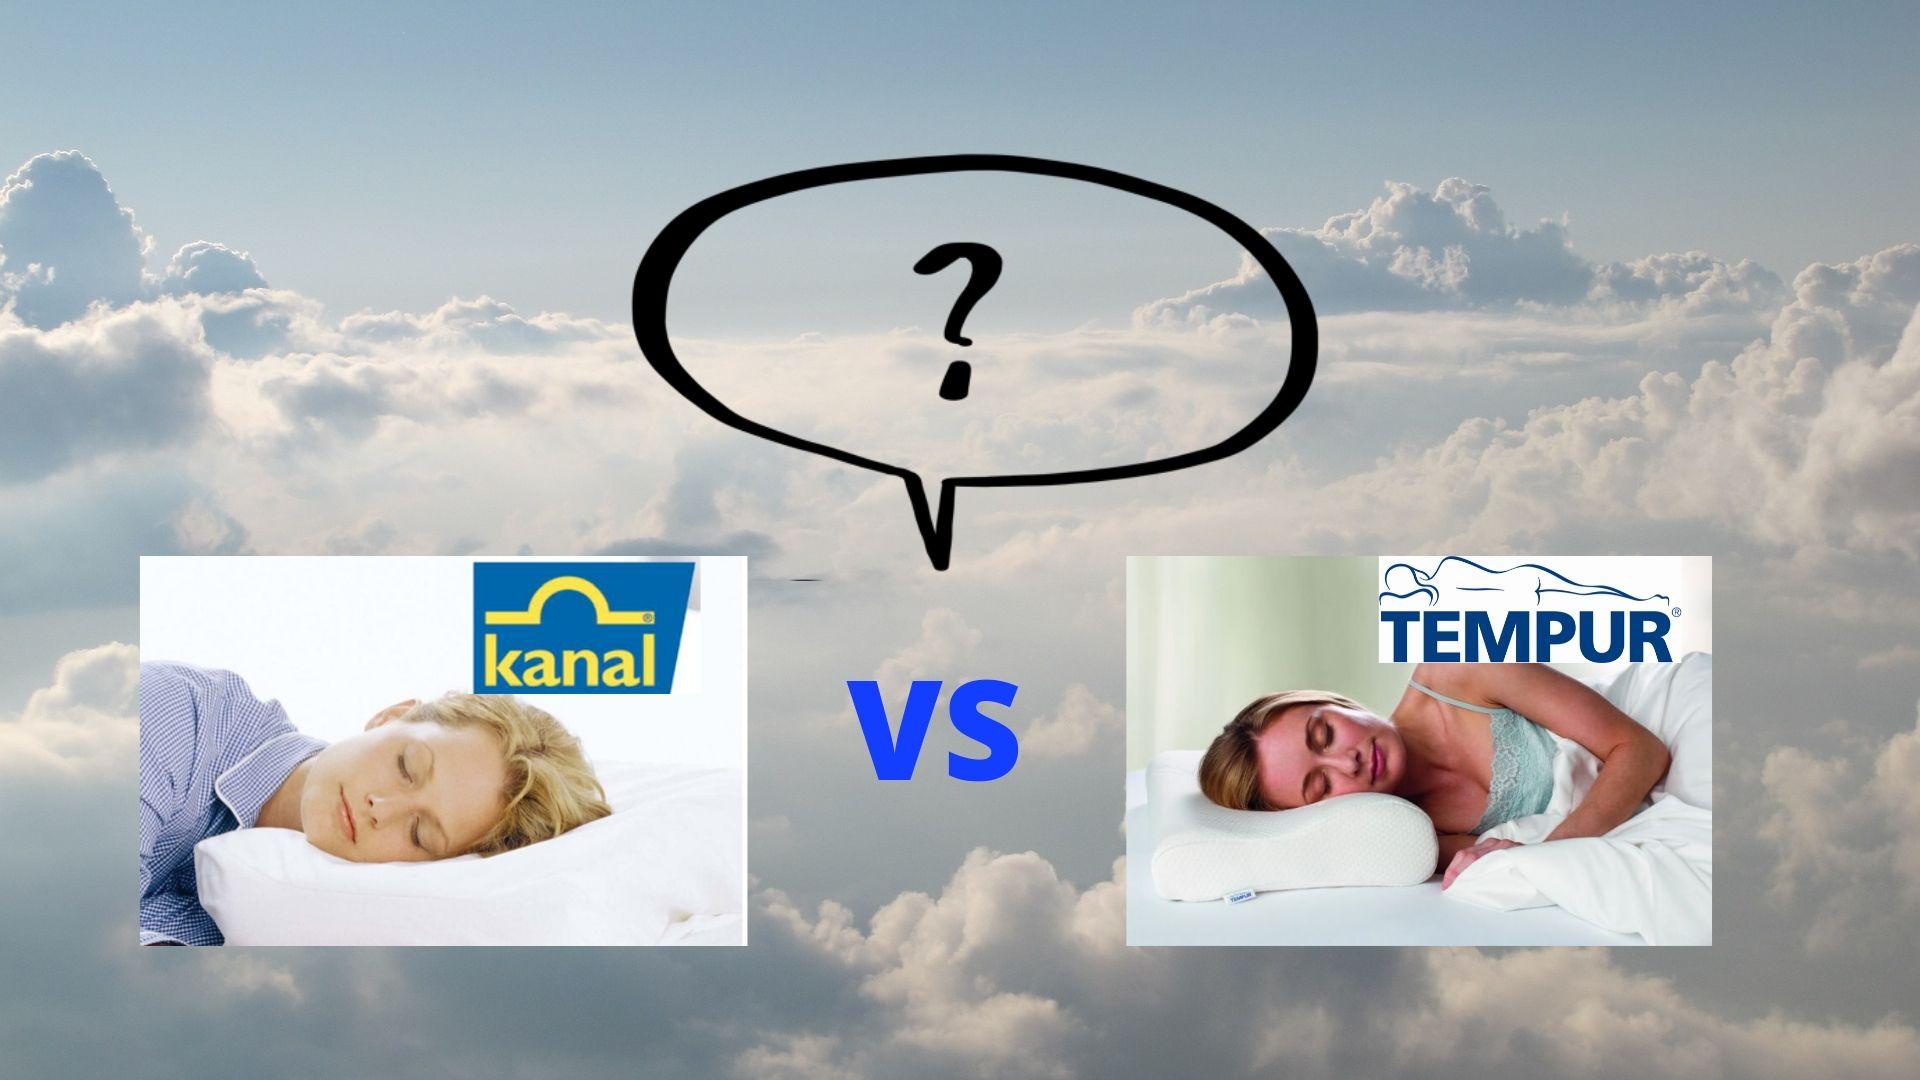 Kanal kuddar vs Tempur kuddar